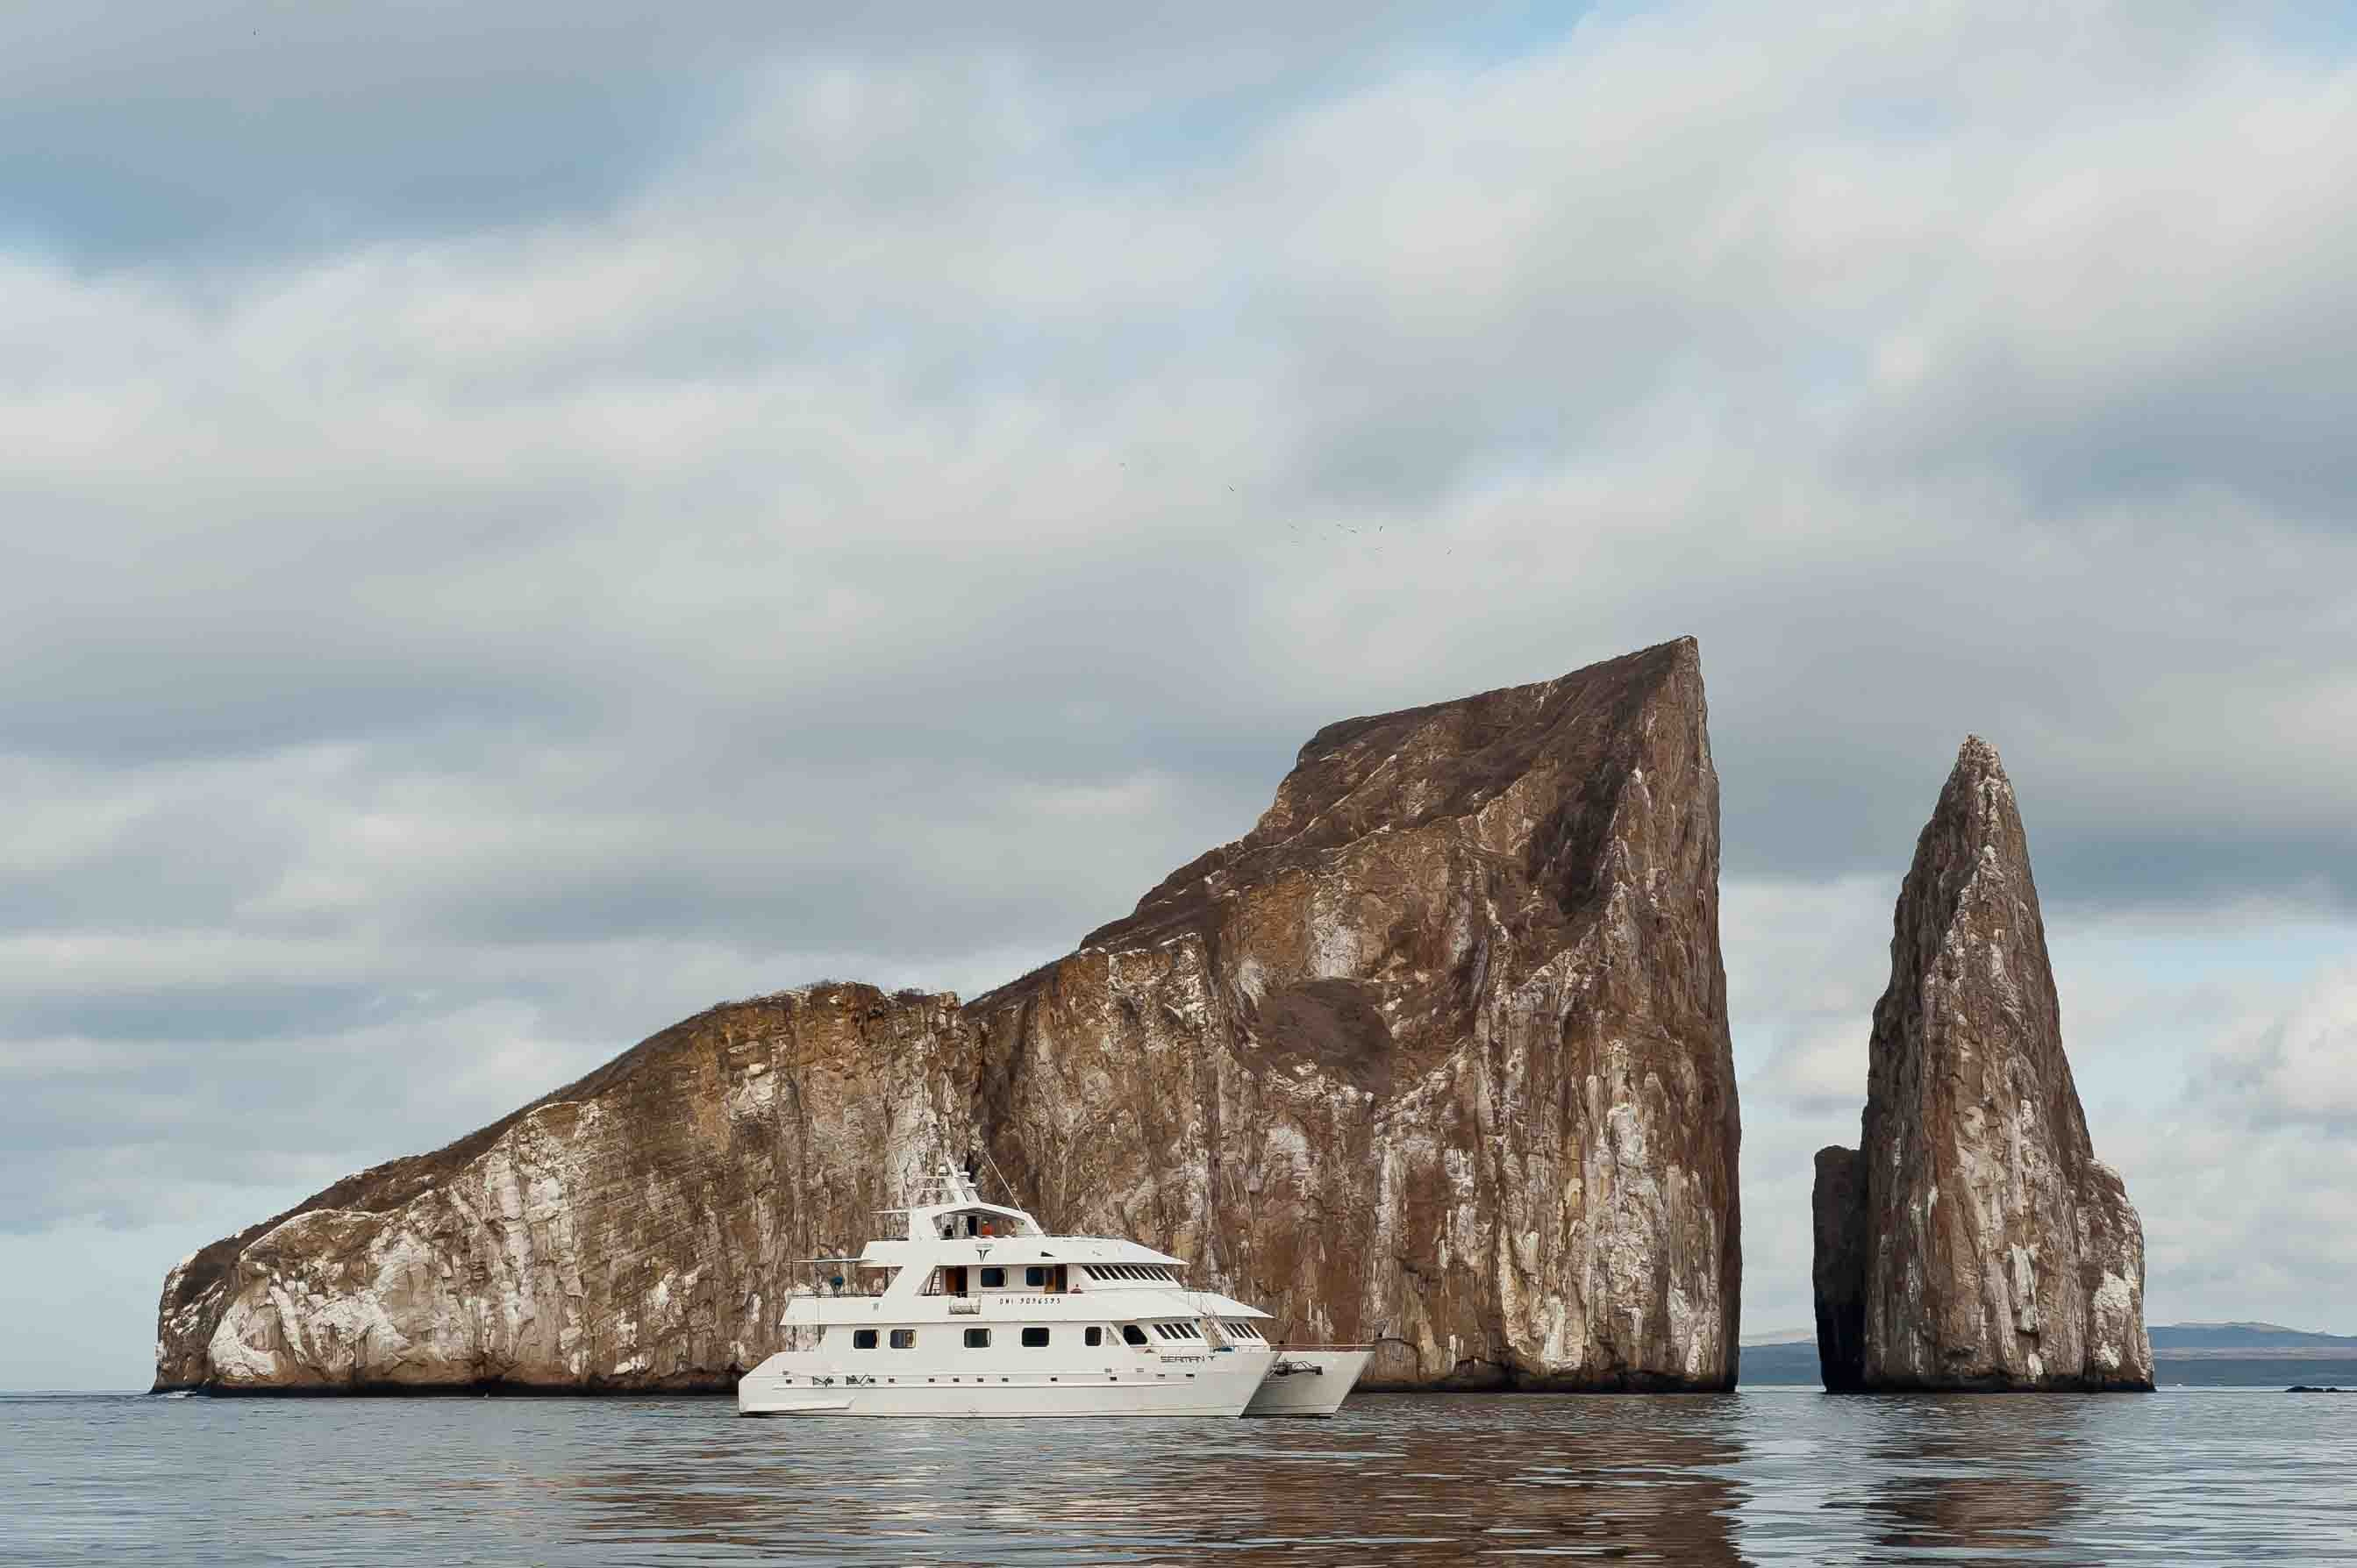 Galapagos Islands | Seaman Journey